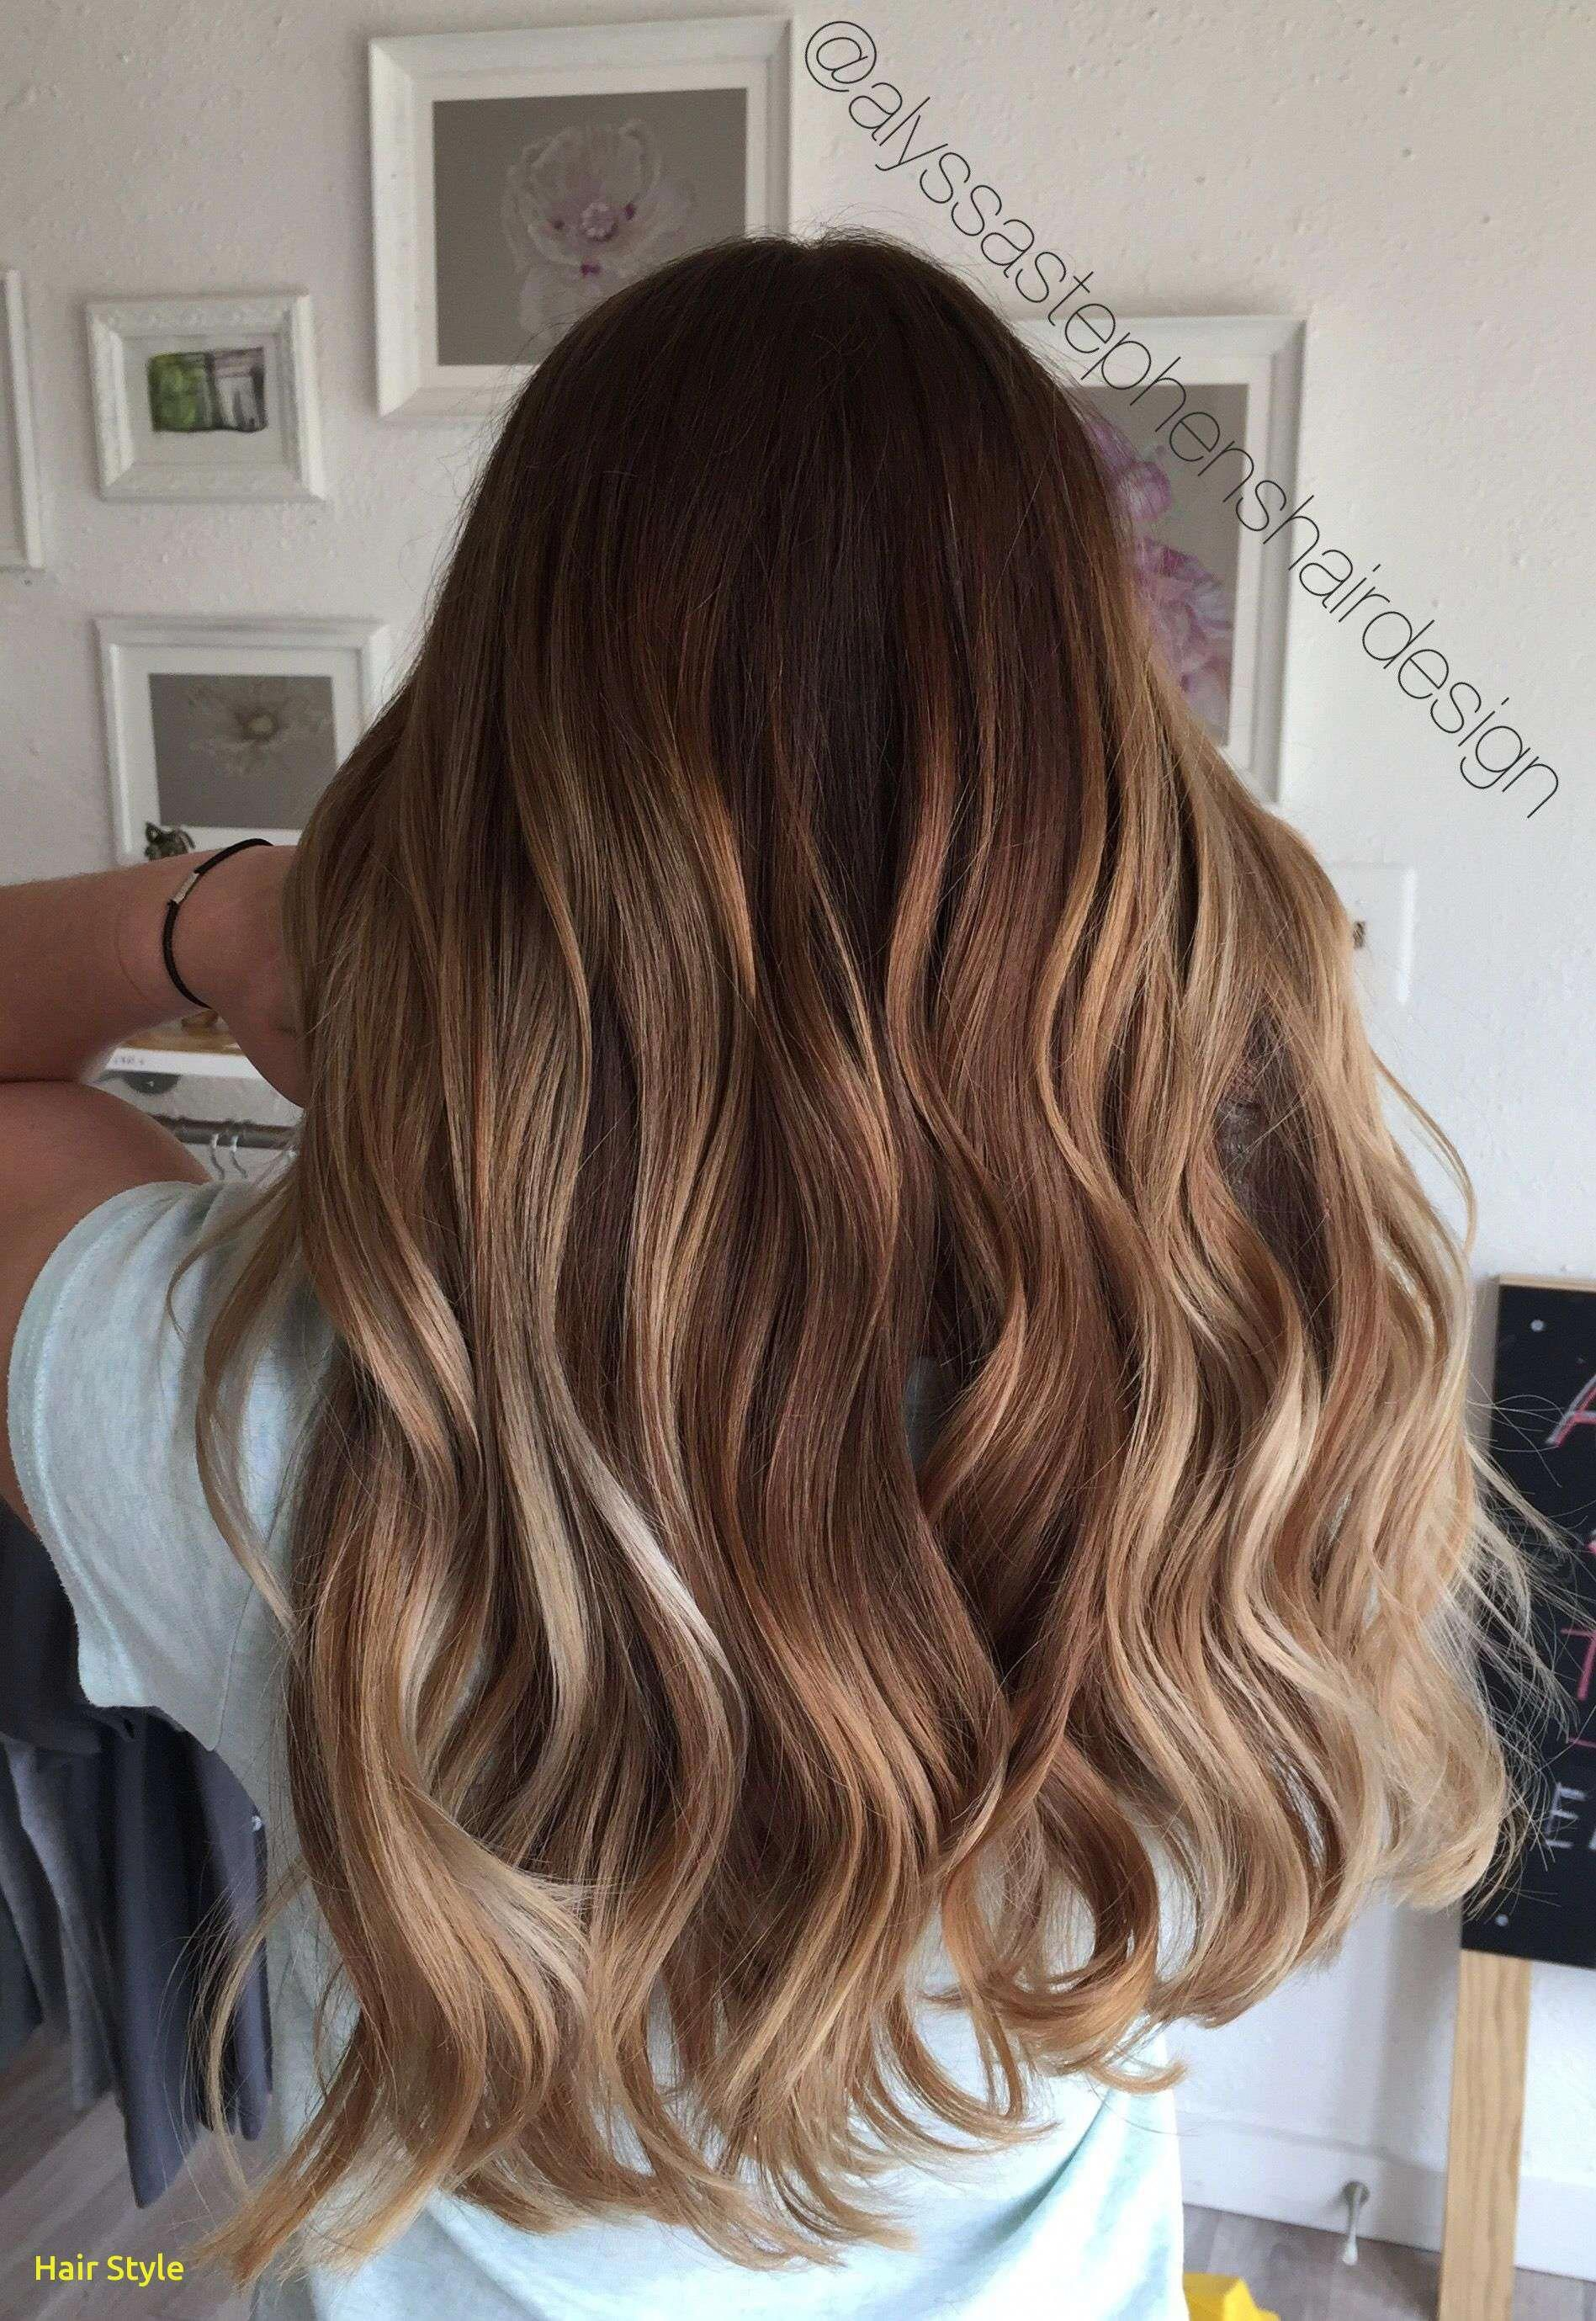 neue herren haarfarbe pinterest #balayage #blonde #2018